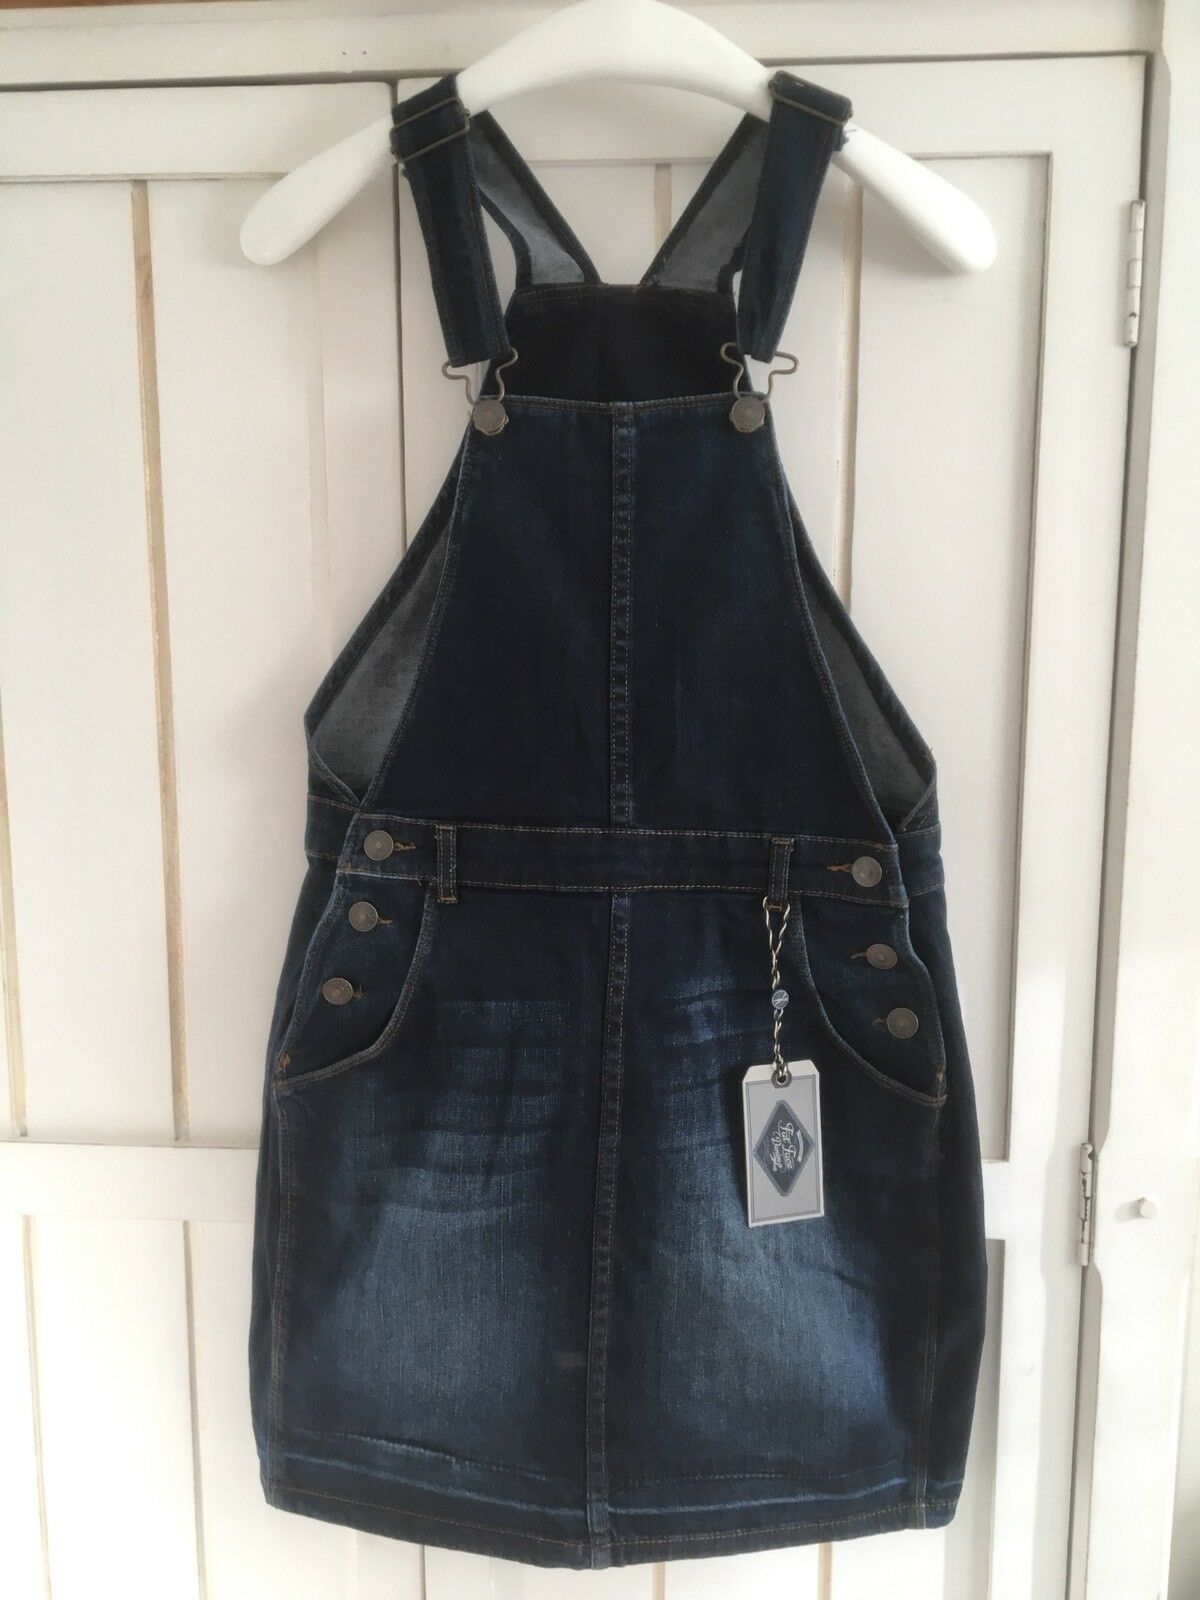 FAT FACE 'Cora' Navy Jeans Dungaree Dress, BNWT